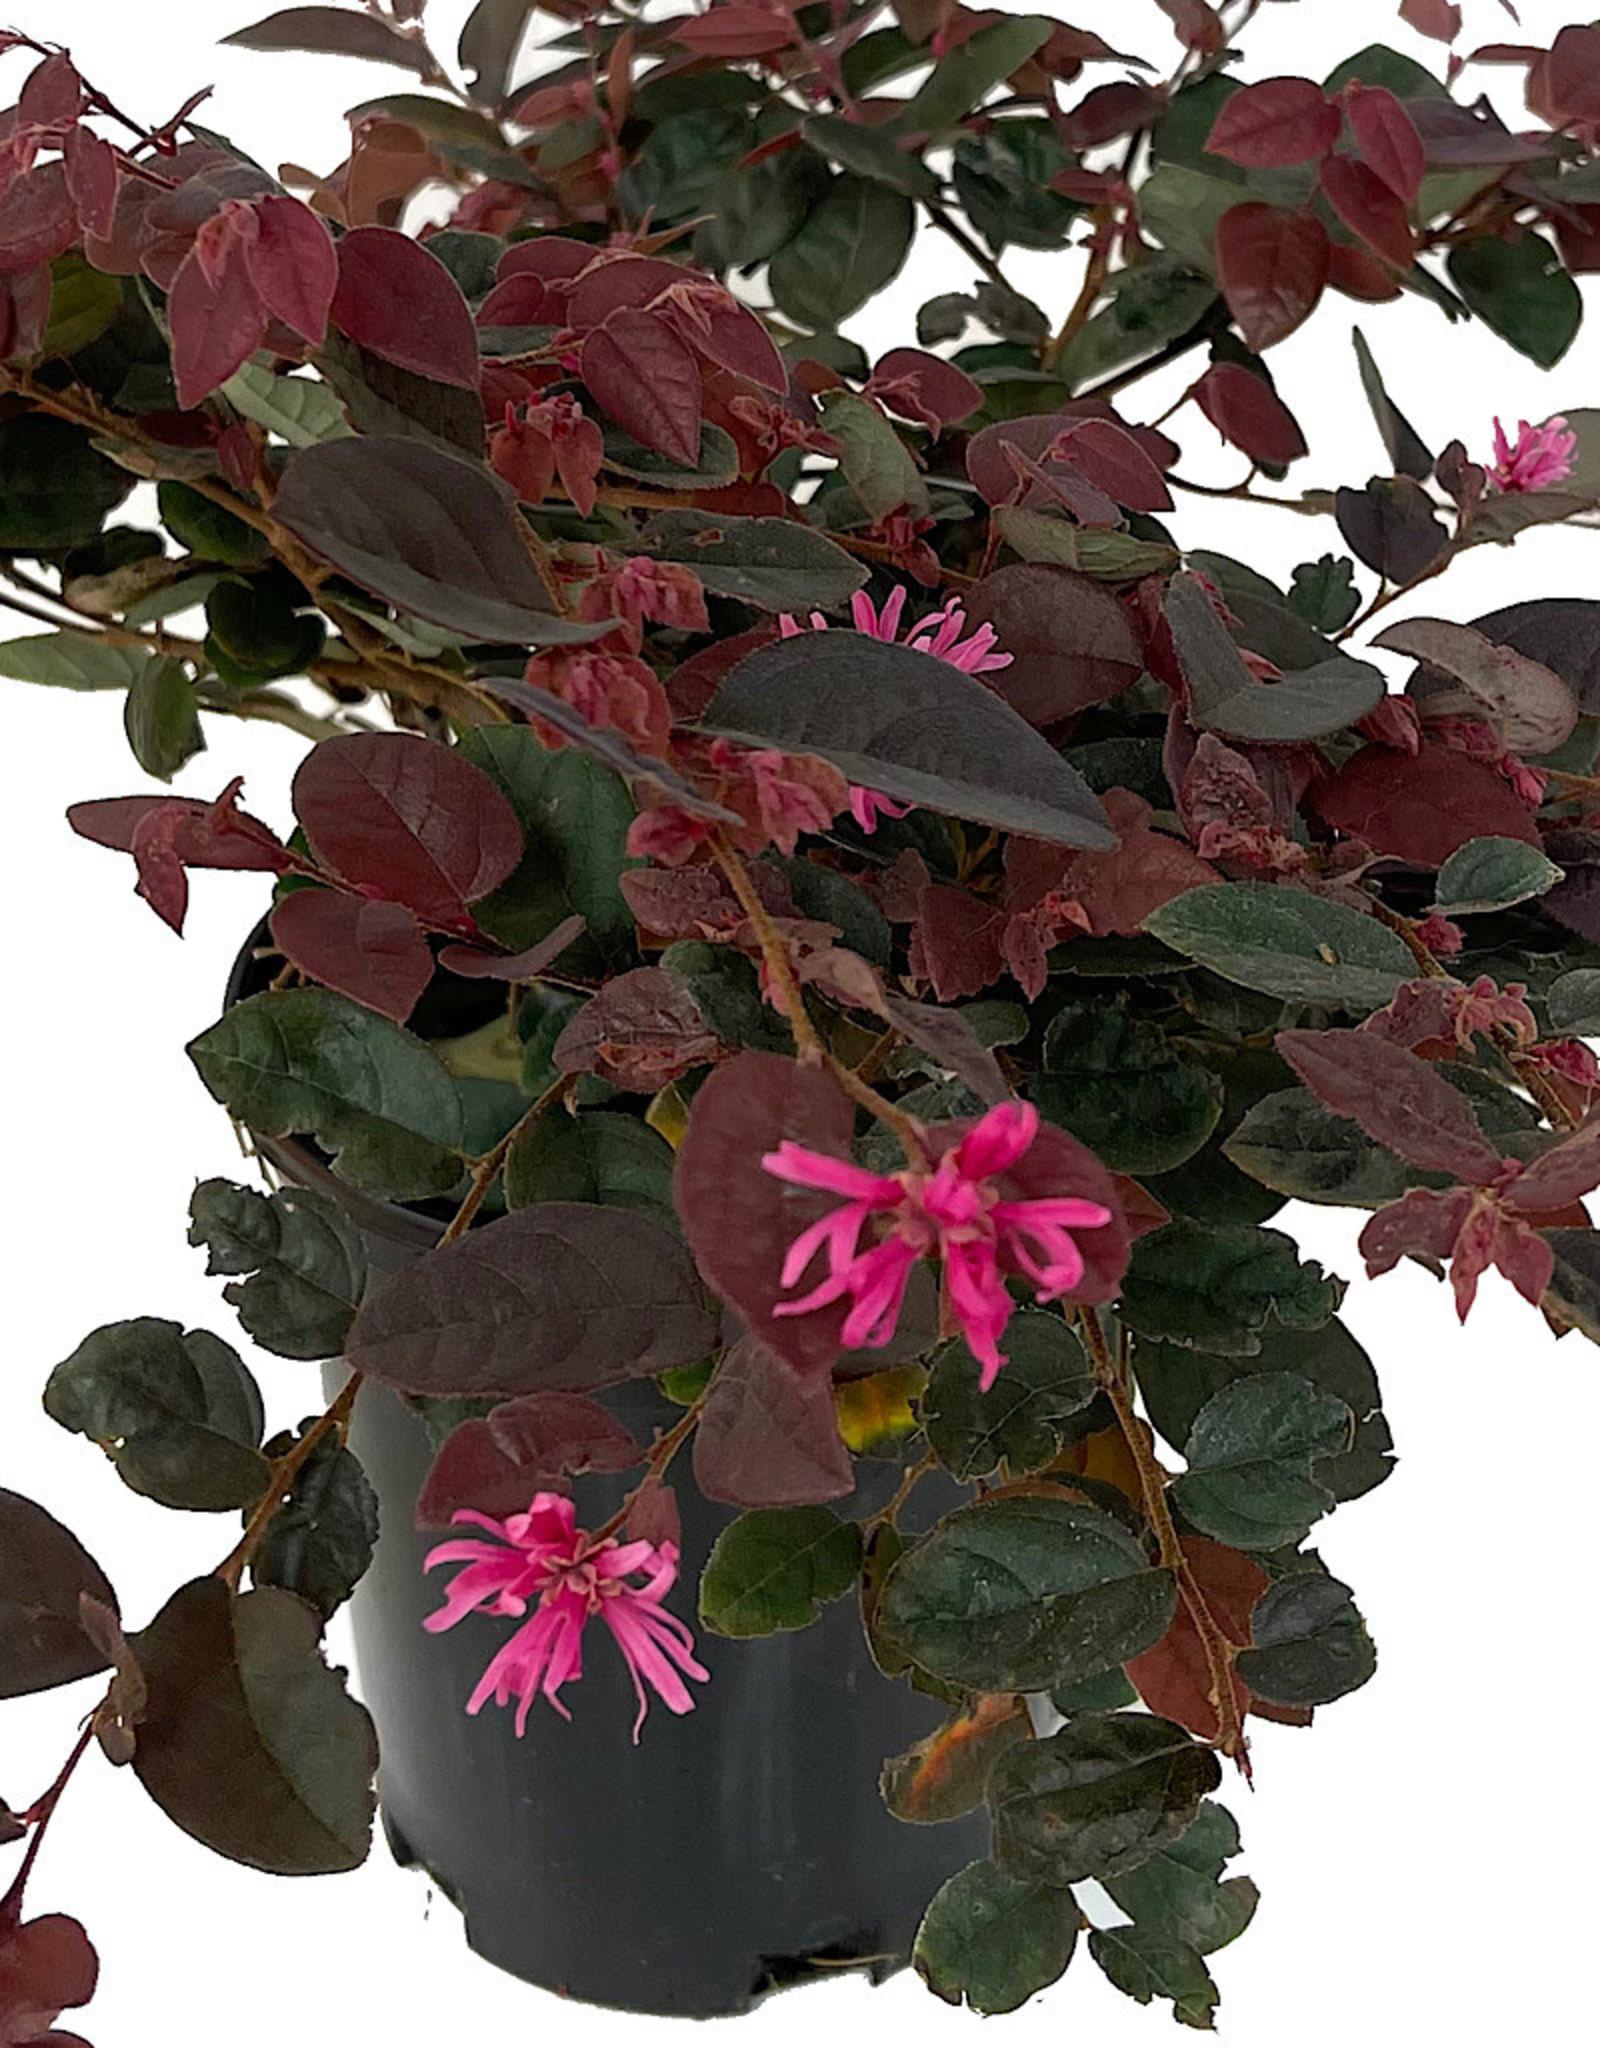 Loropetalum 'Sizzling Pink' 1 Gallon